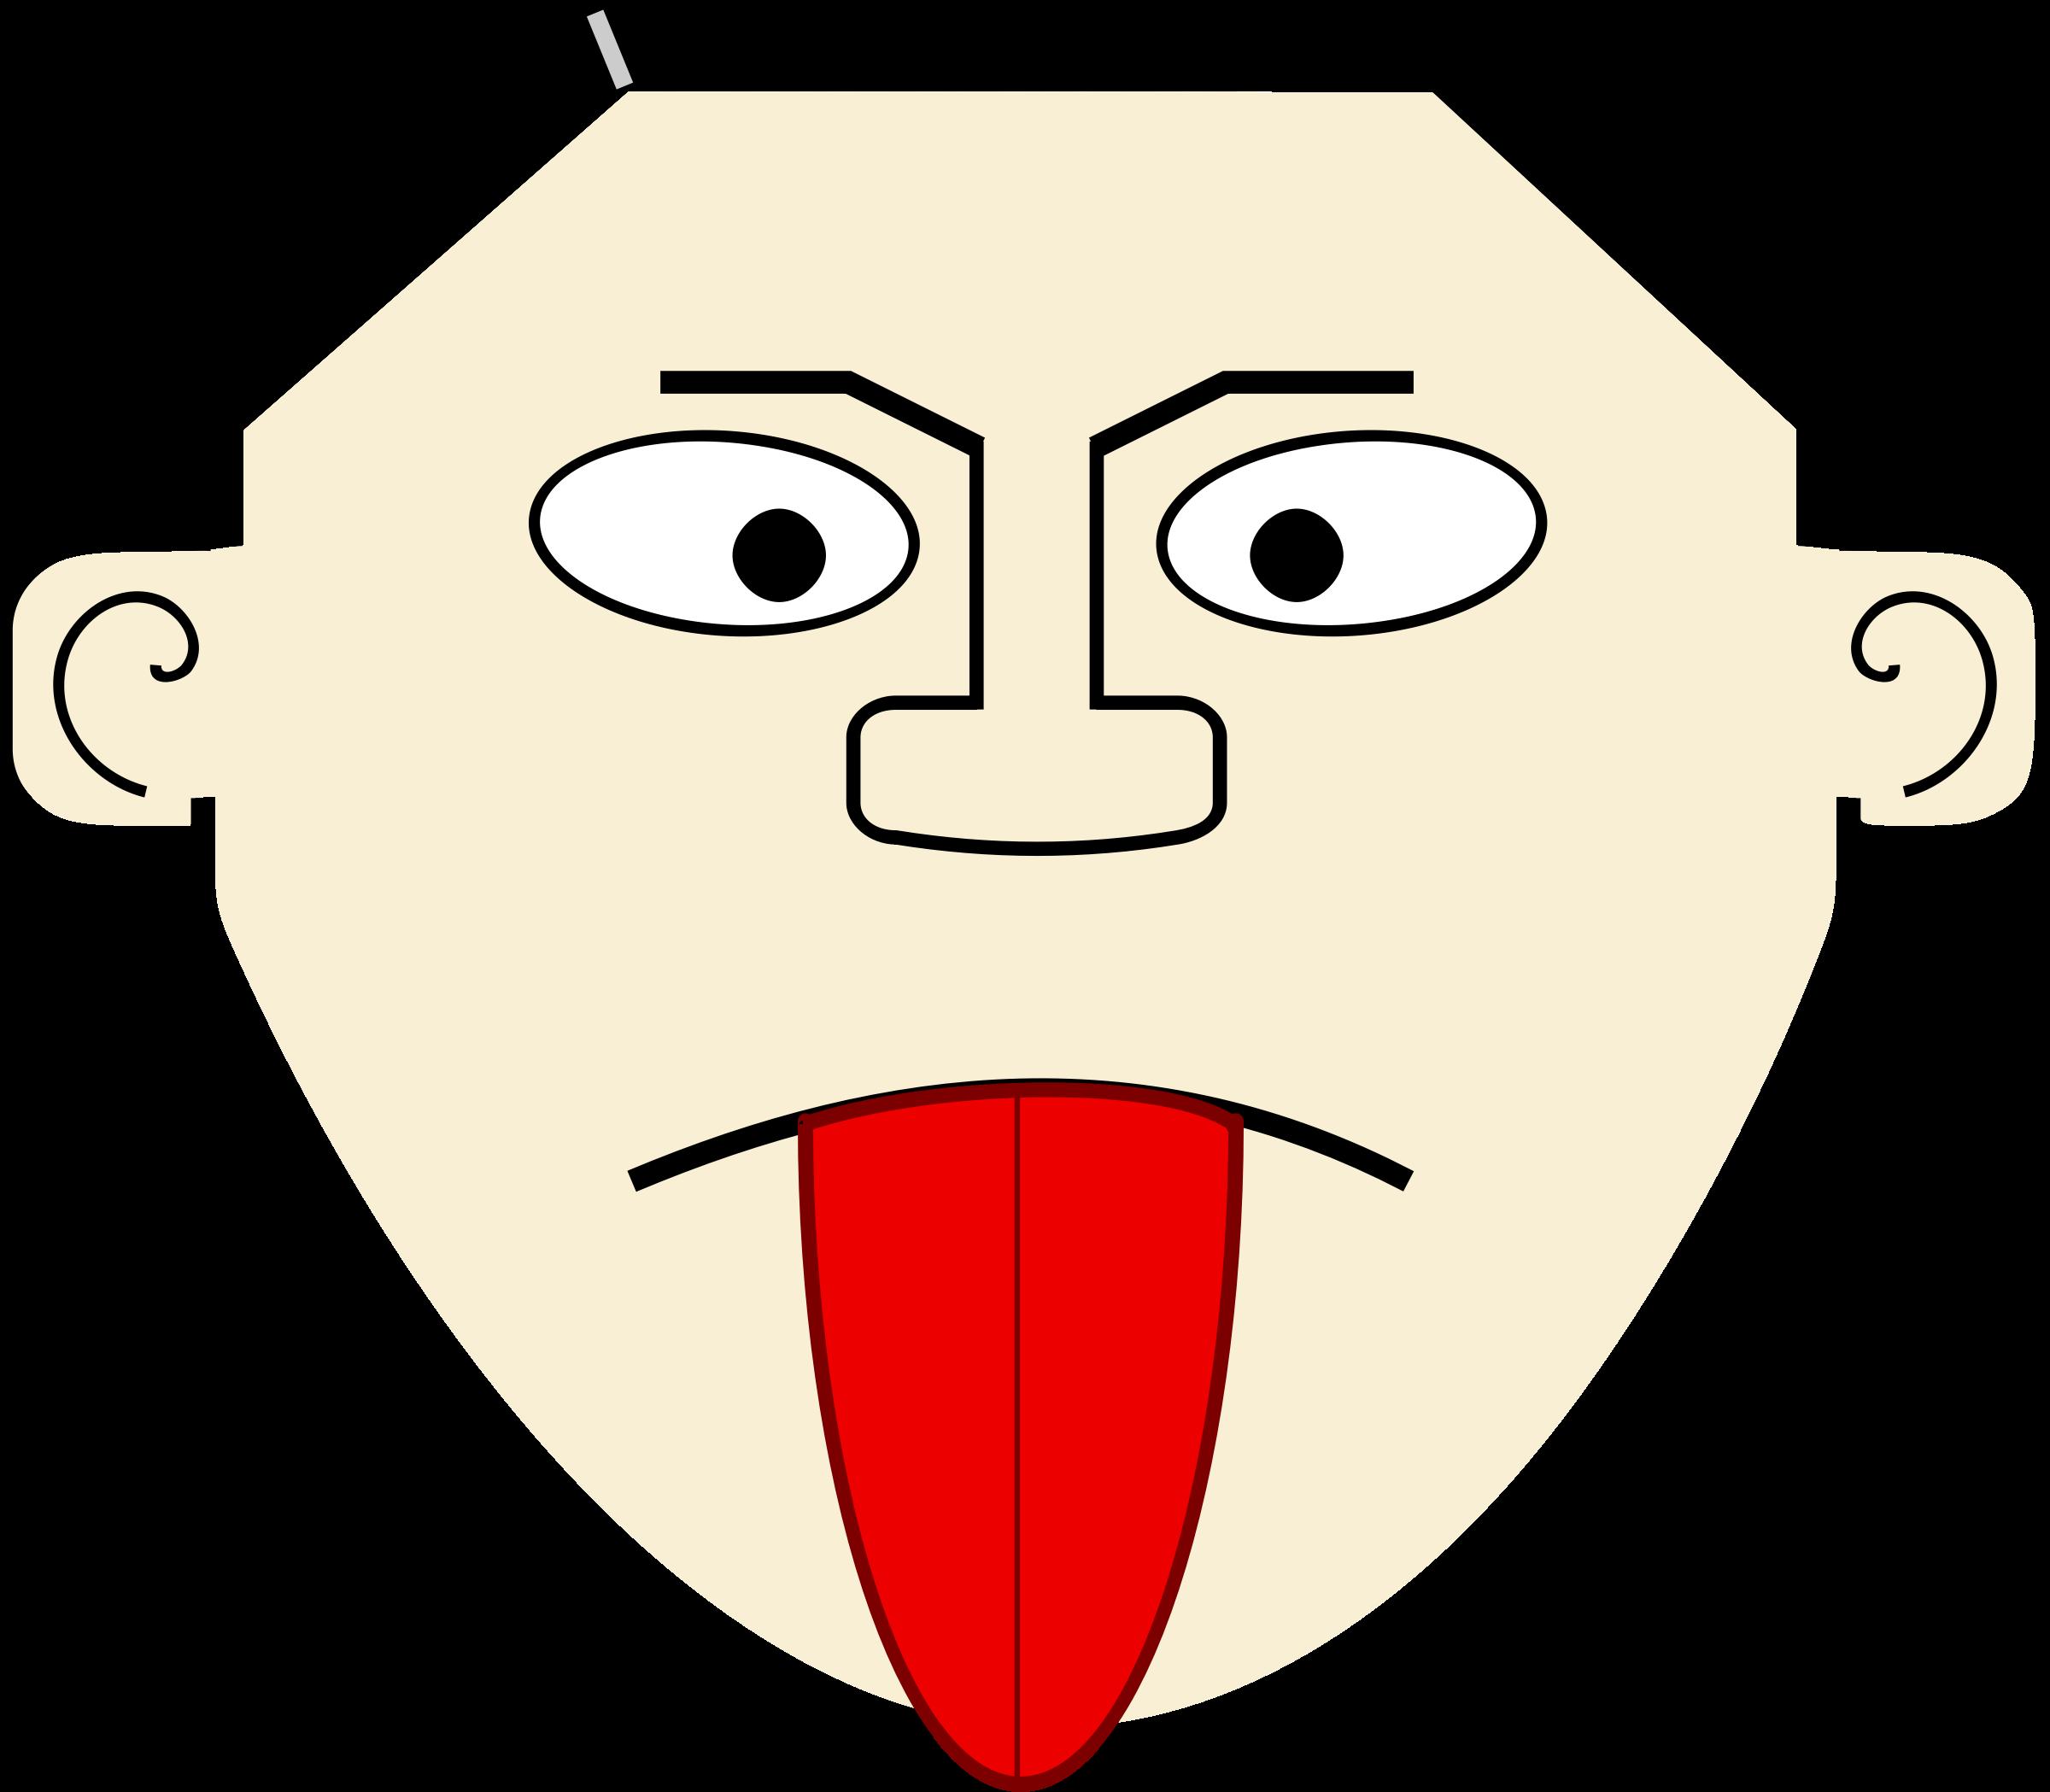 Cartoon tongue big image. Taste clipart tung